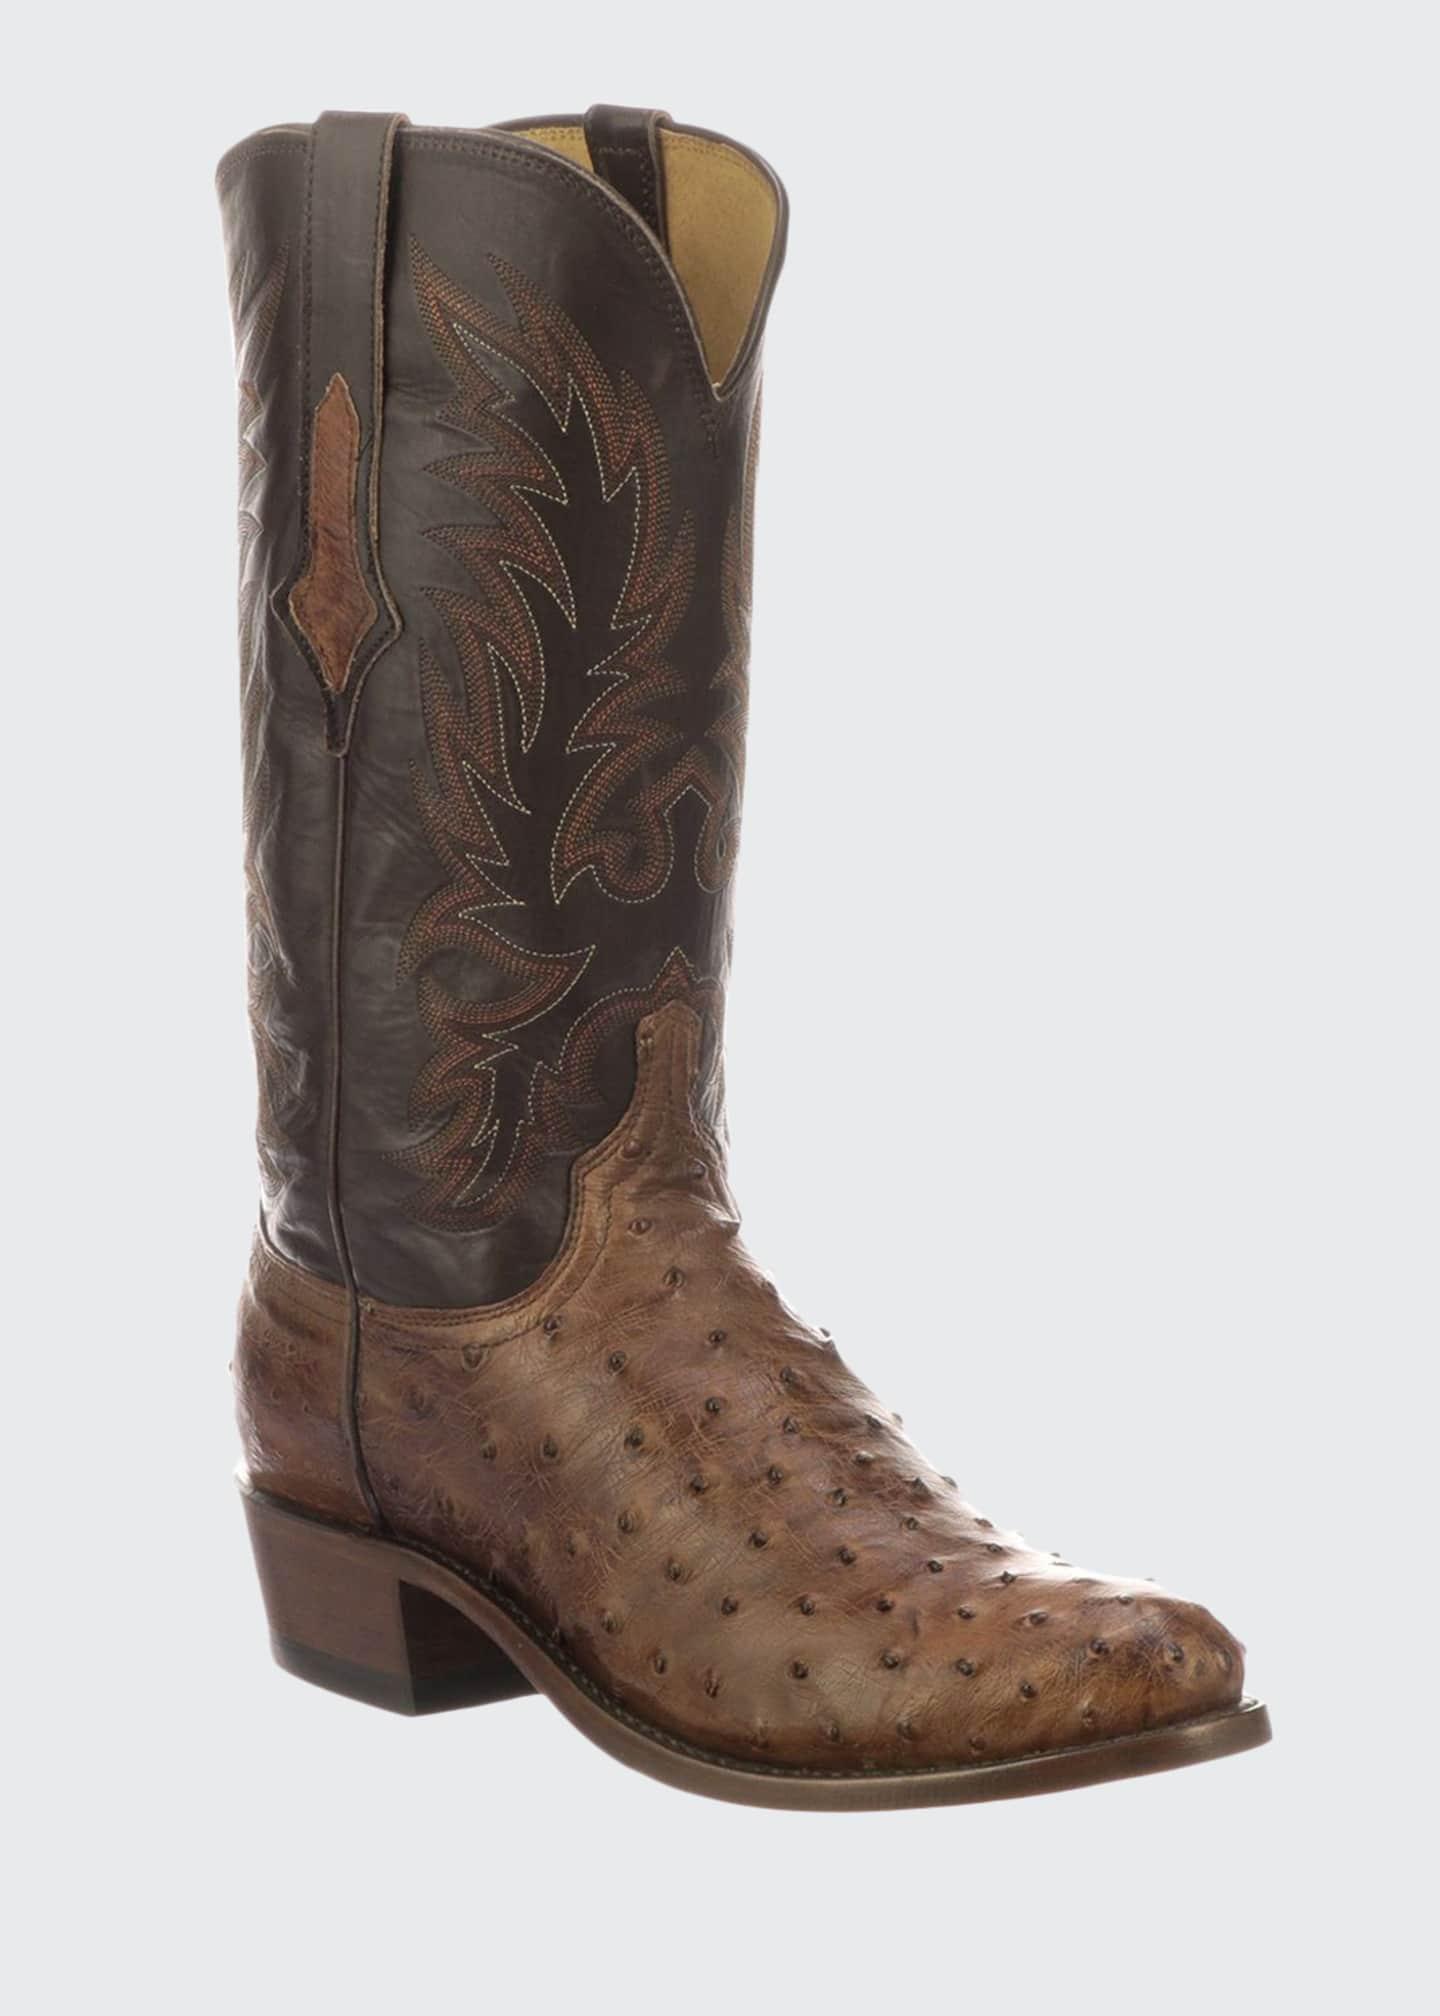 Lucchese Men's Elgin Ostrich Cowboy Boots